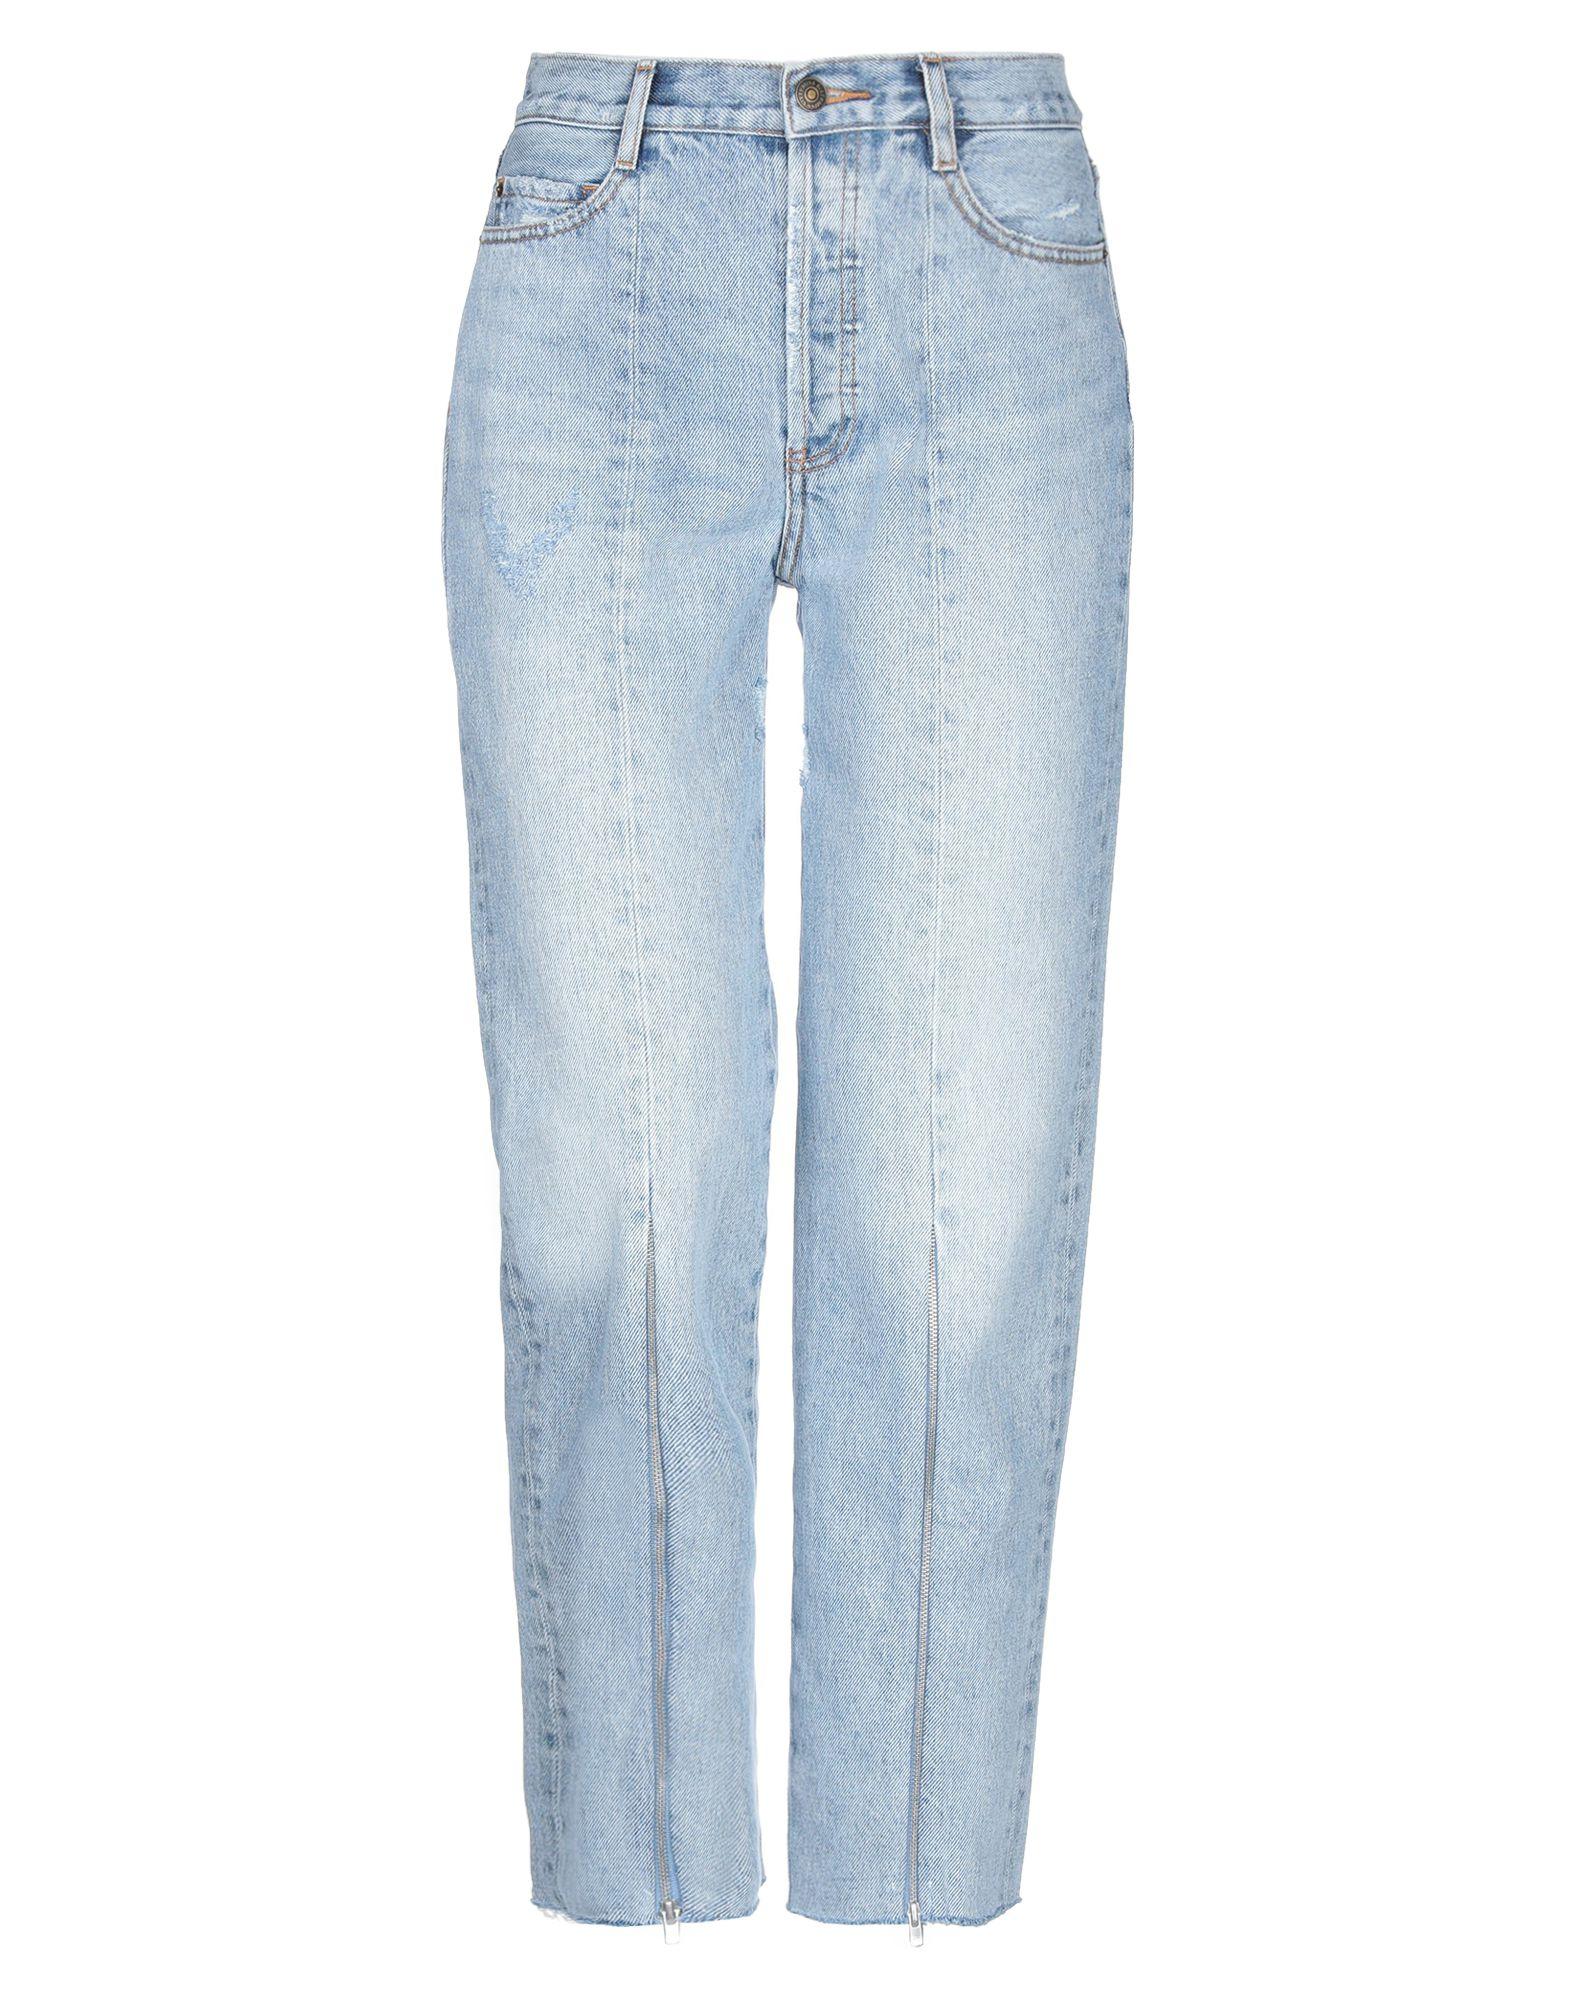 цена на MISS SIXTY Джинсовые брюки